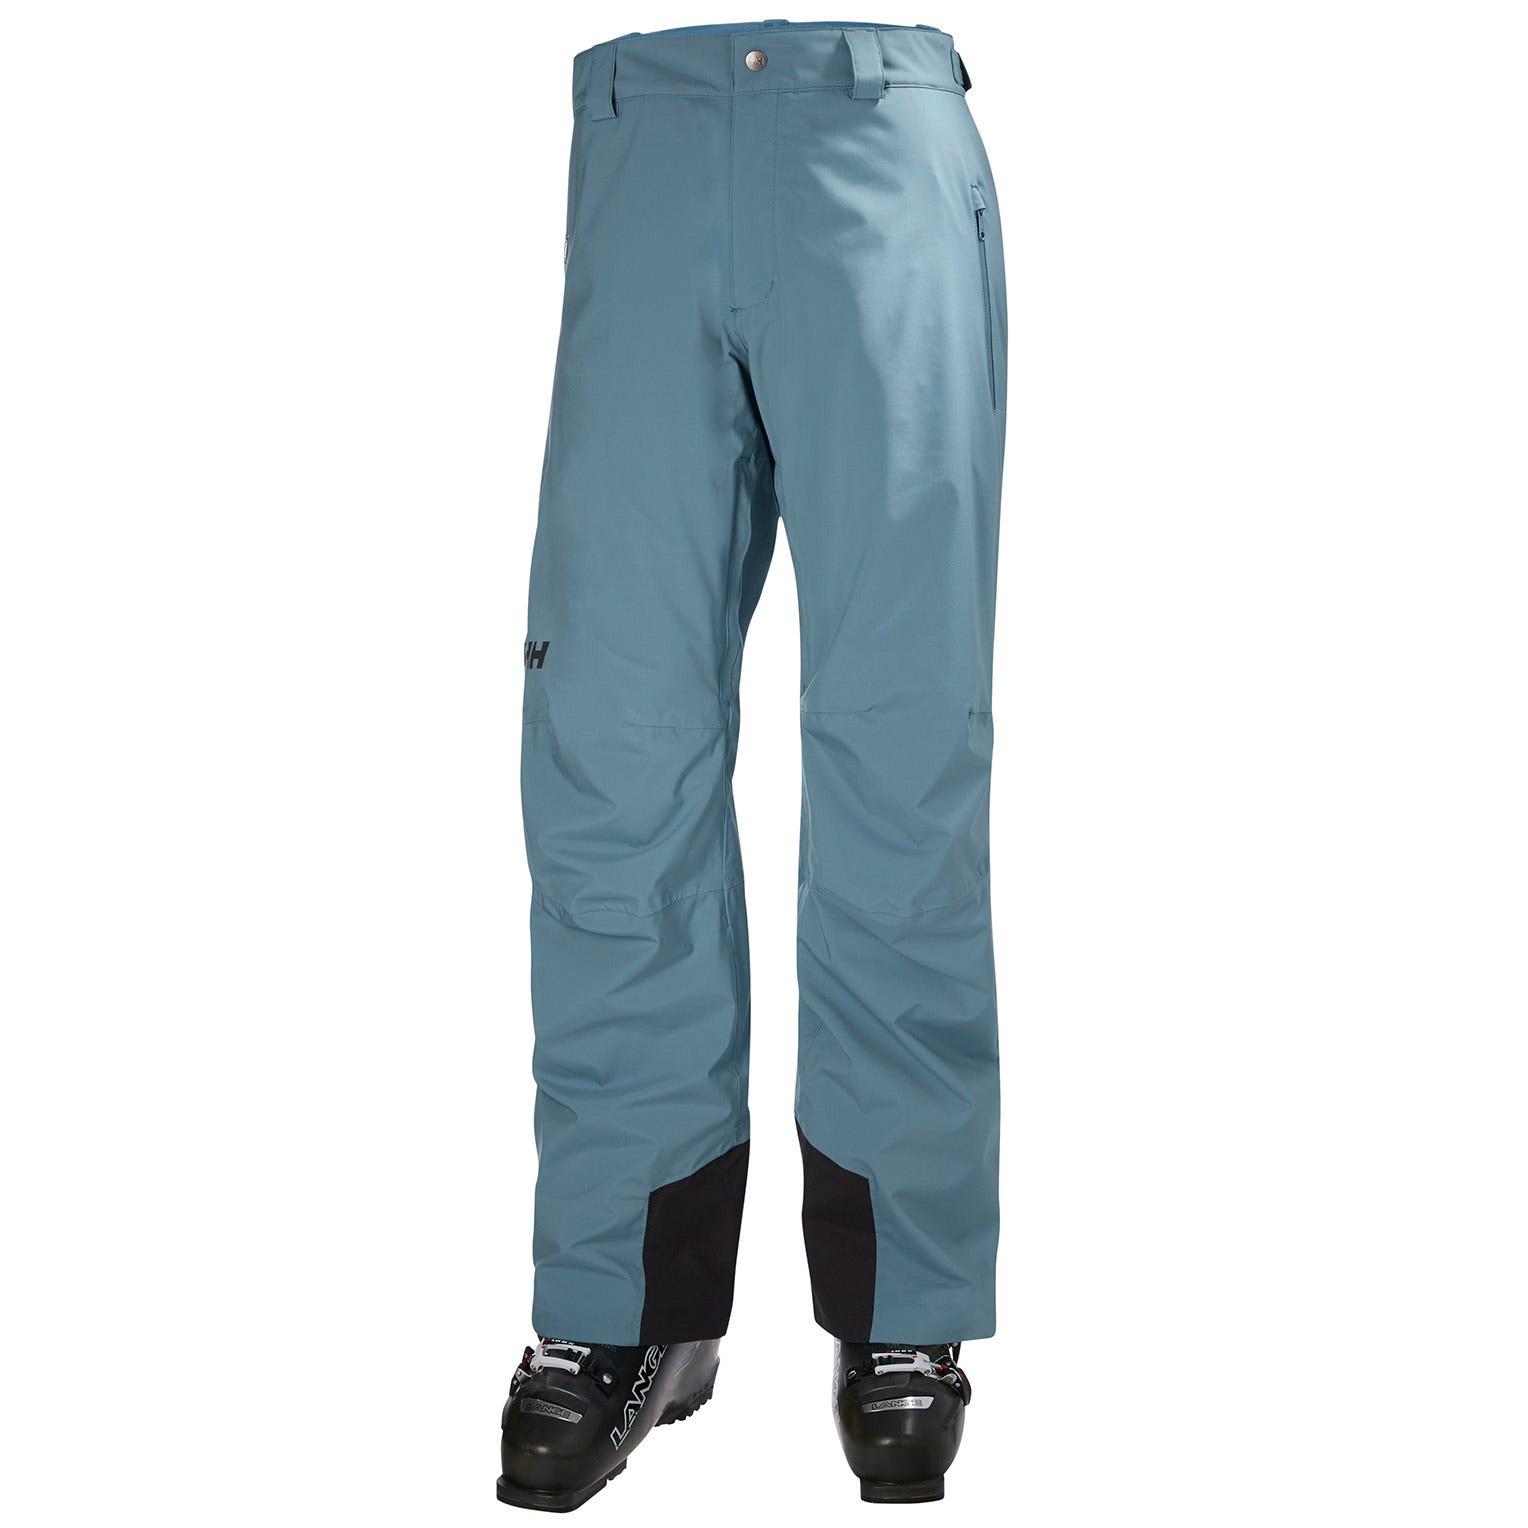 Helly Hansen Mens Legendary Insulated Ski Trouser Blue XL